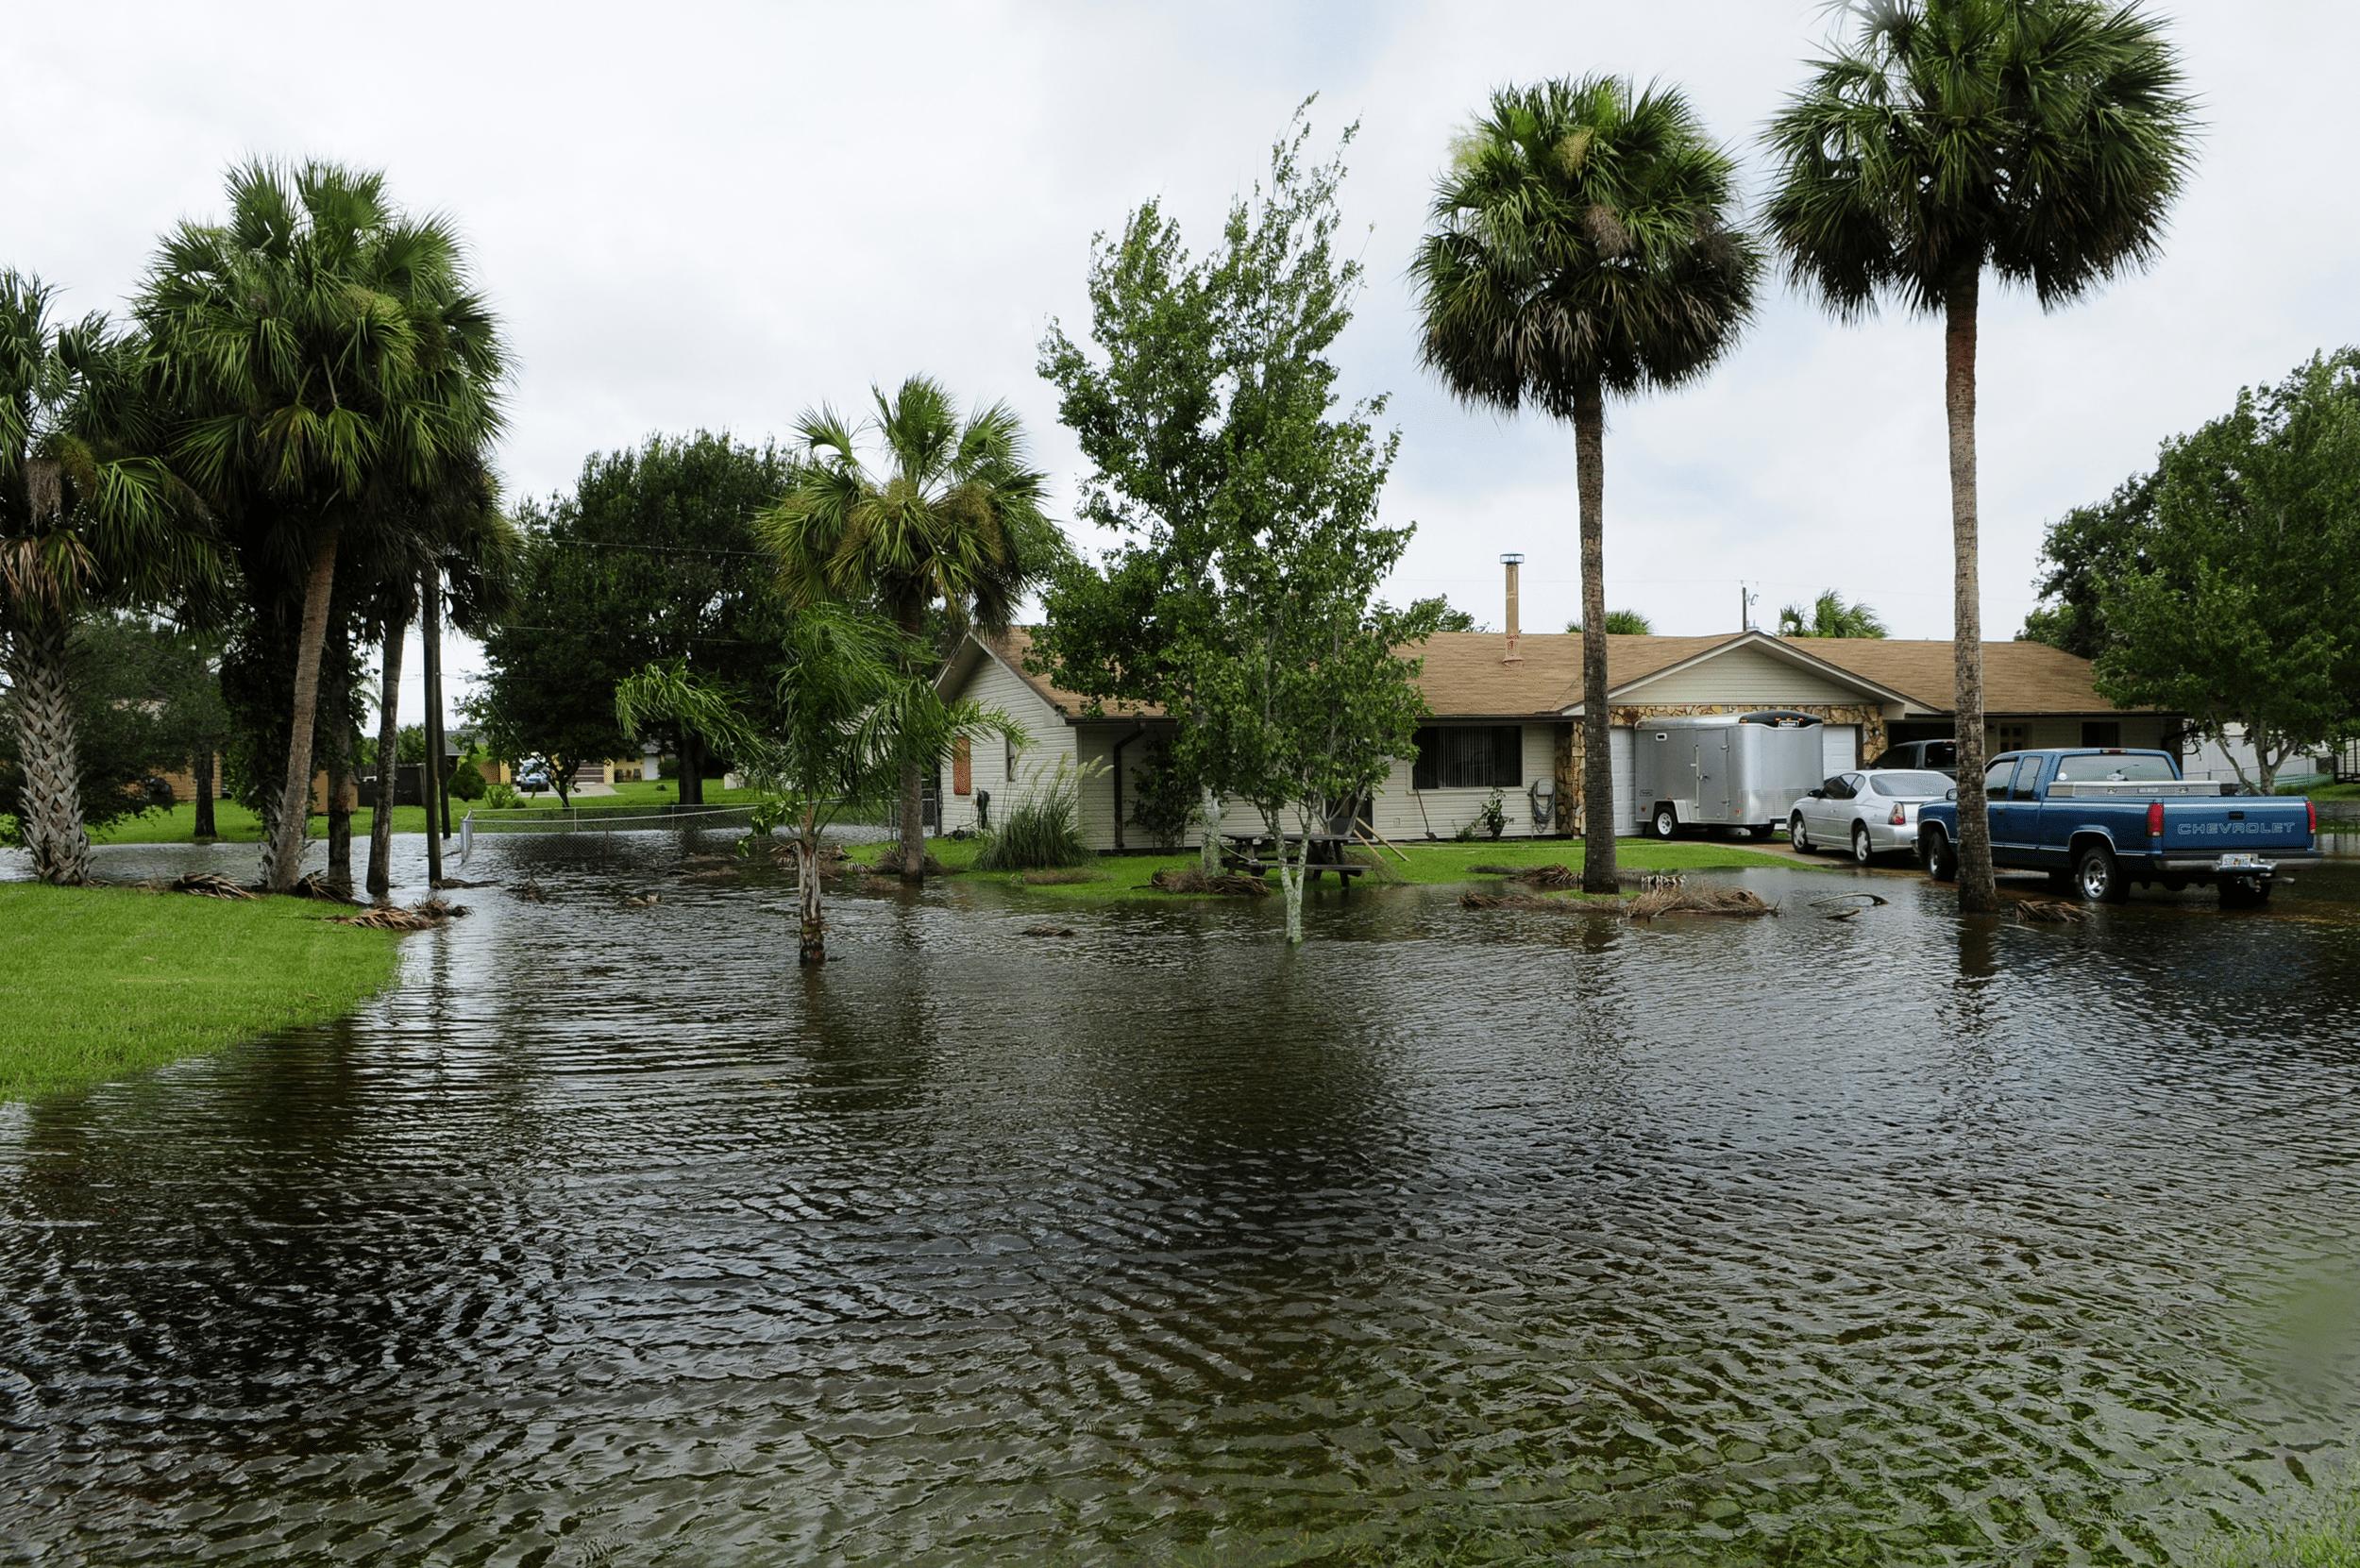 Flood Insurance Quotes Flood Insurance  V.wgould Agency Inc Vwgould Agency Inc